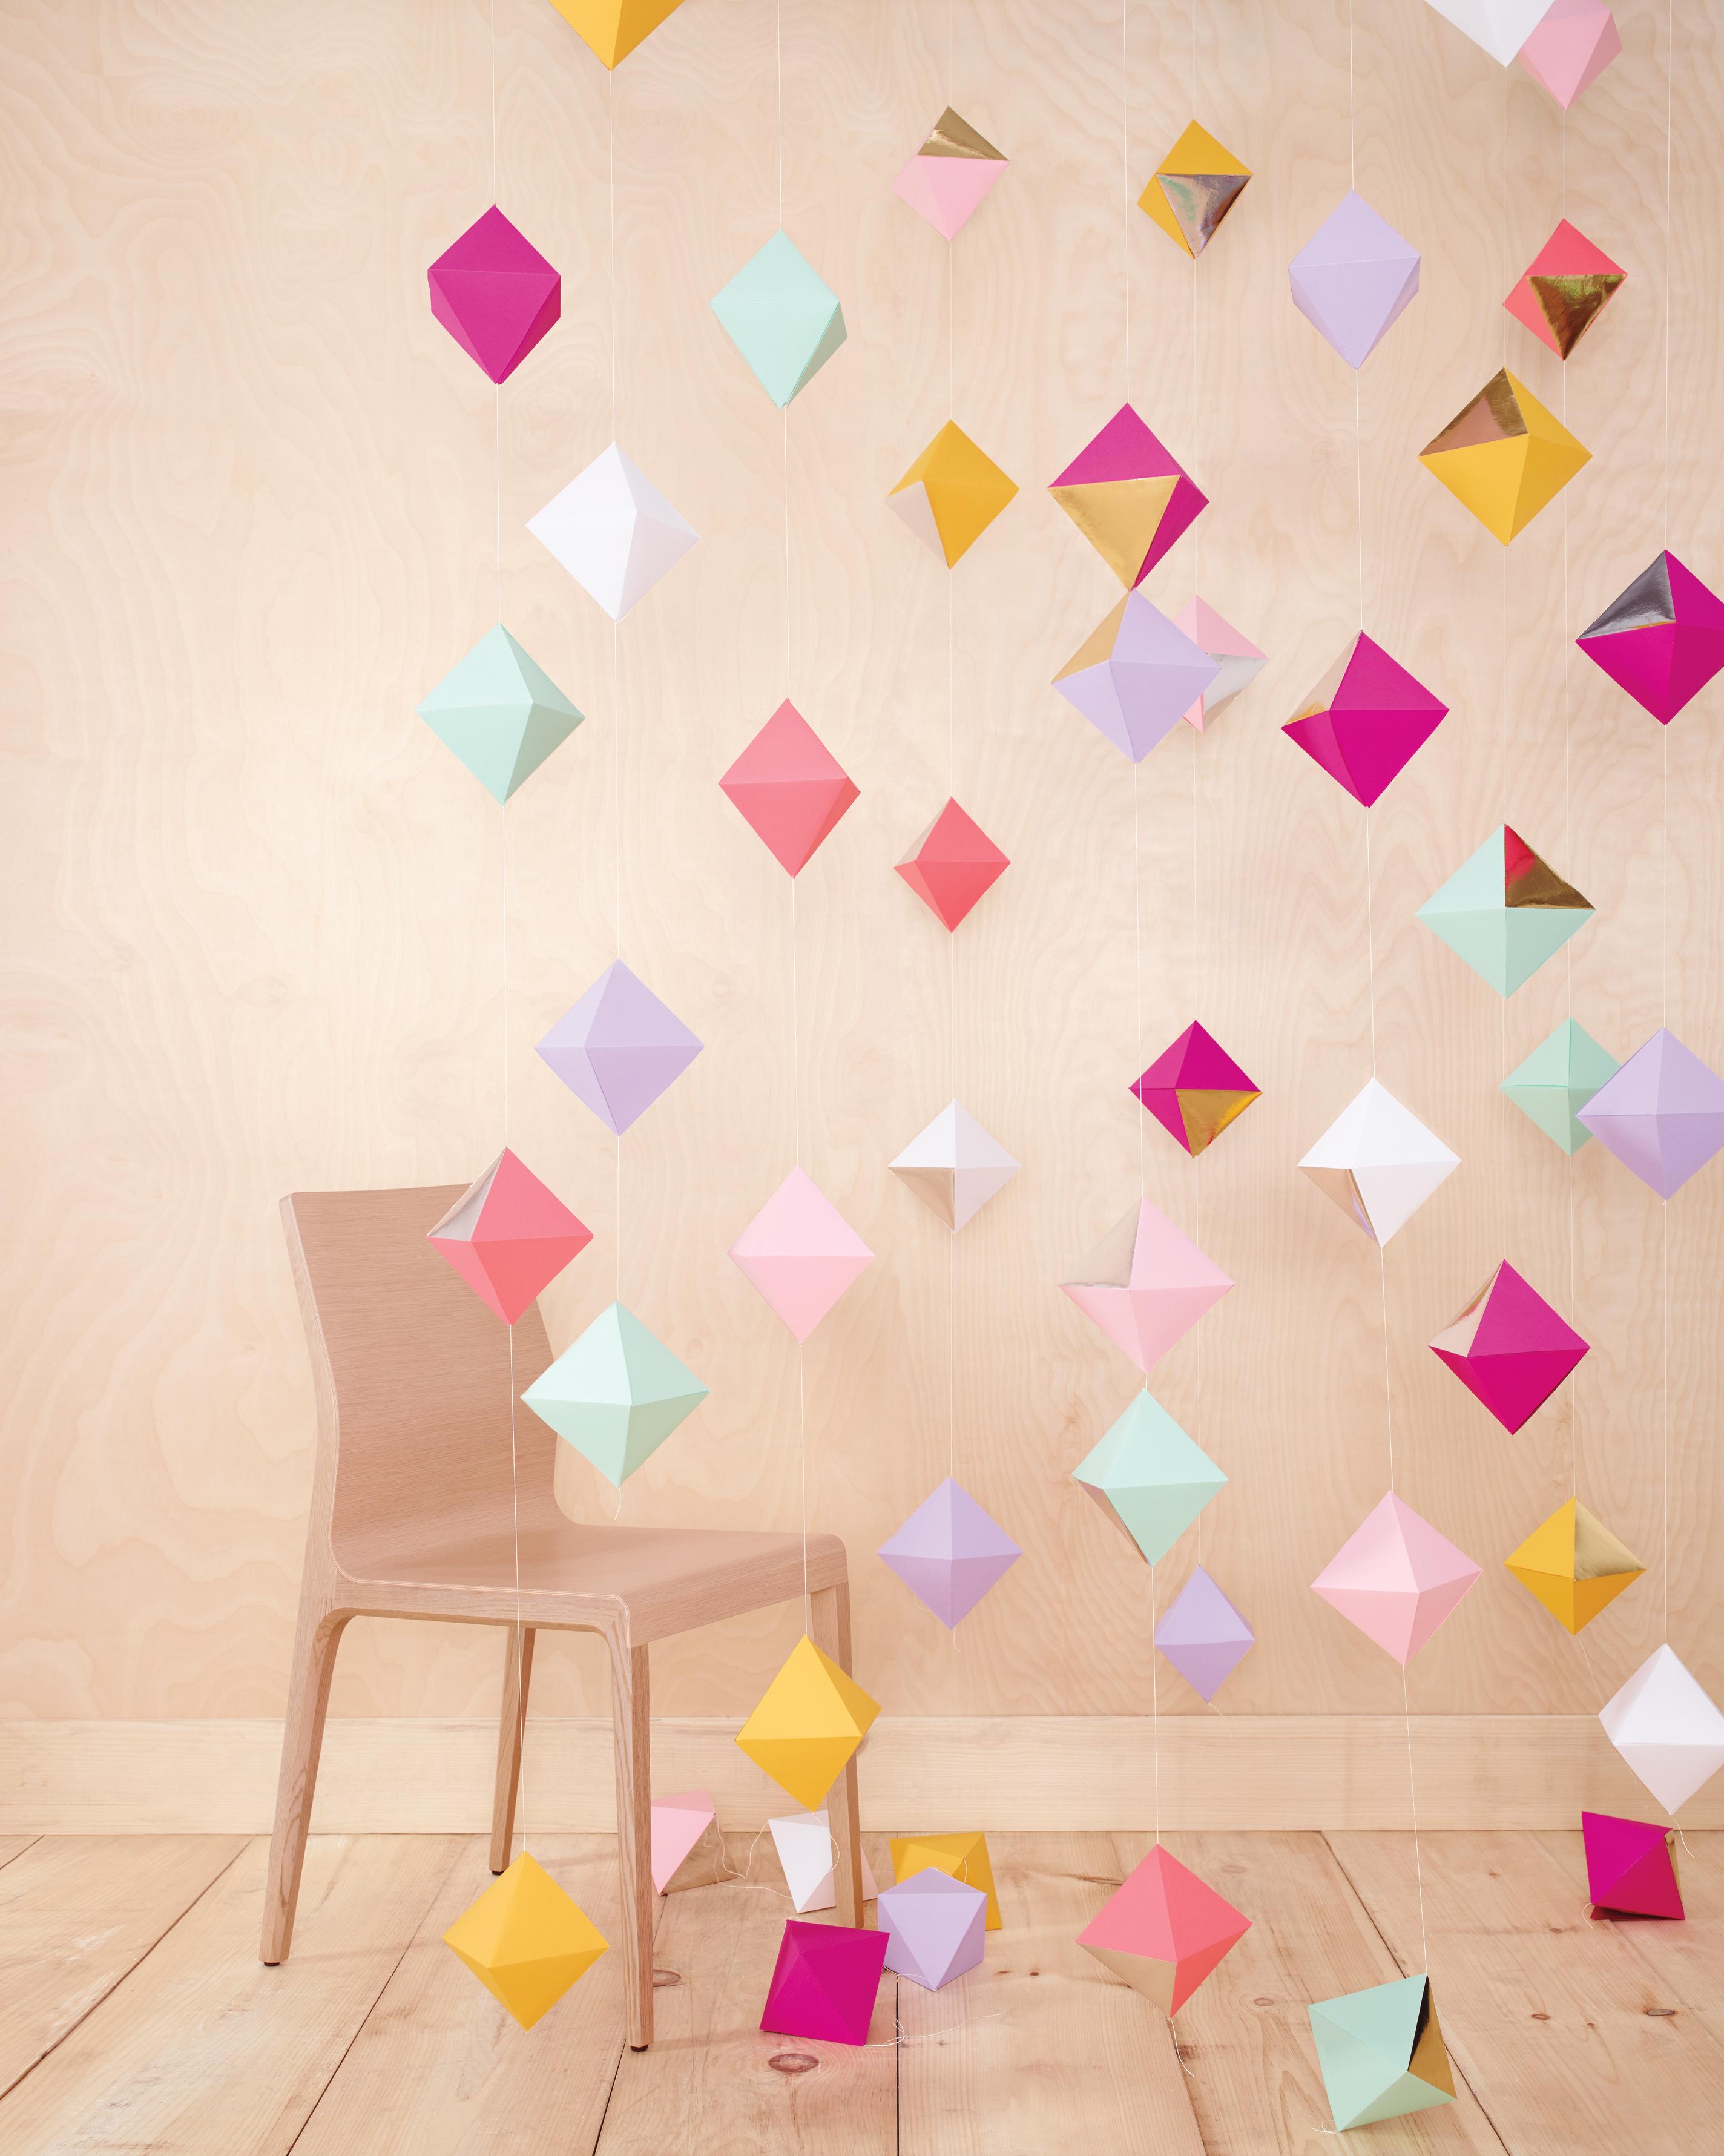 chair-hanging-diamond-garlands-0031-comp-mwd110757.jpg